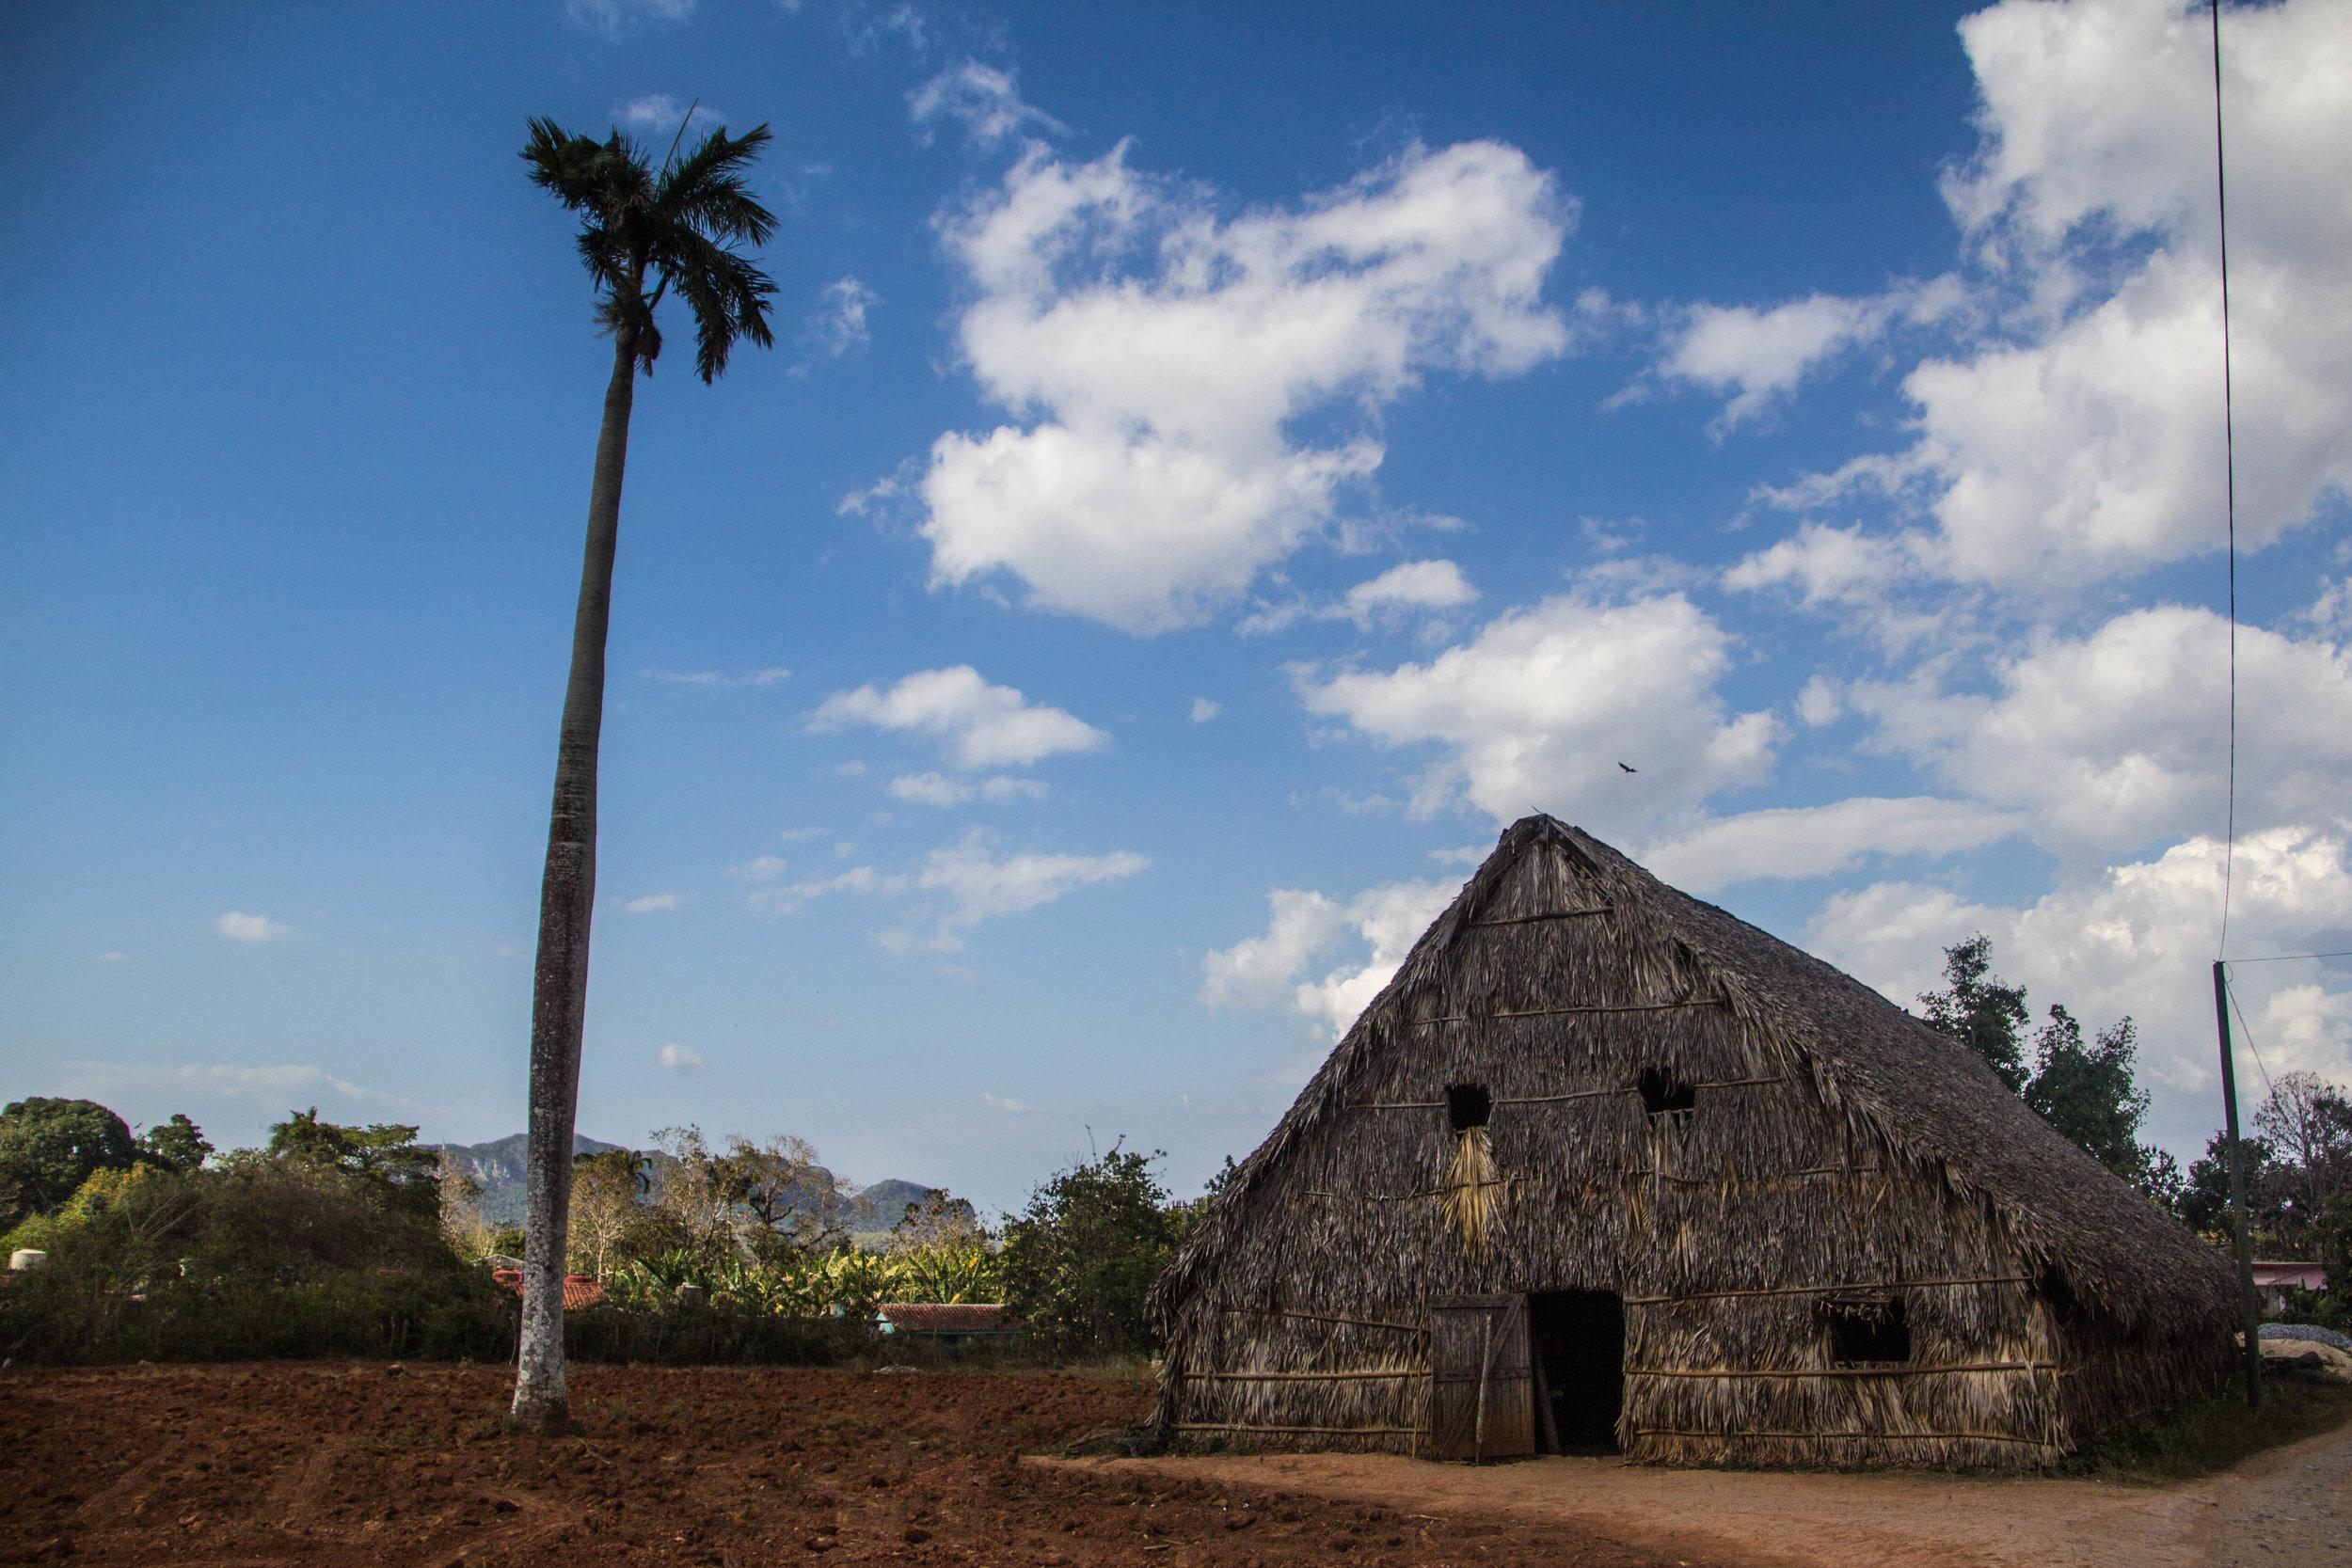 tobacco house viñales cuba-1-4.jpg